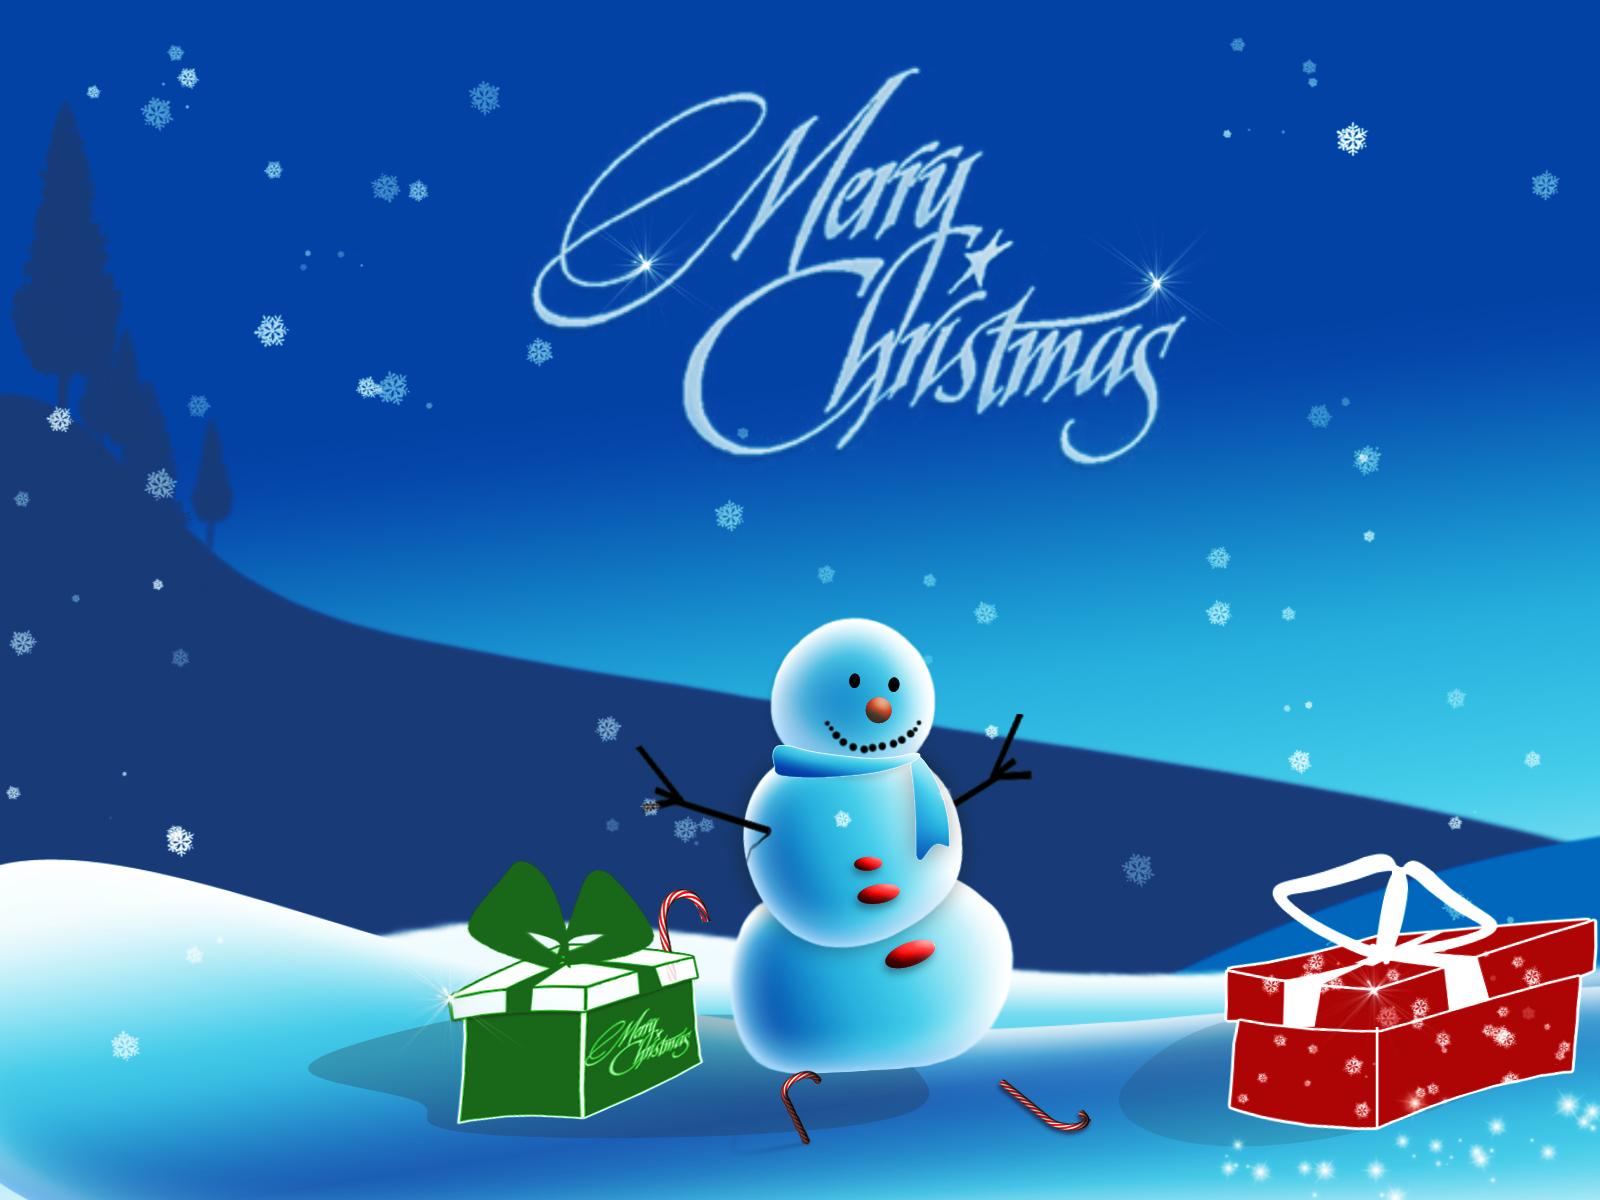 Free Christmas Wallpaper 011